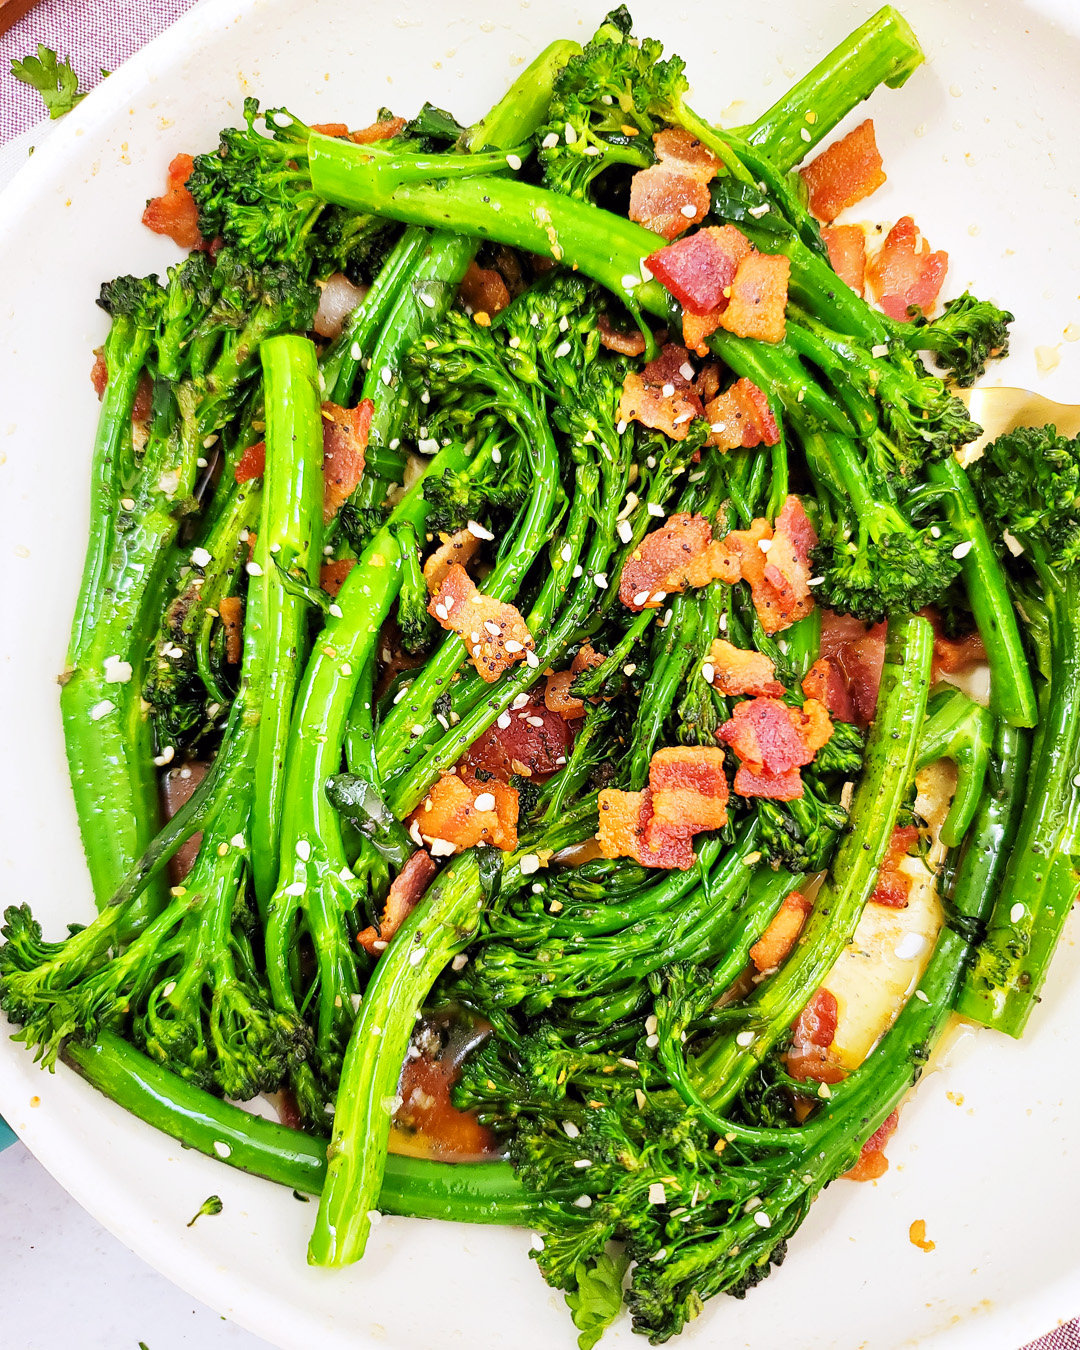 Garlicky Sautéed Broccolette with Bacon